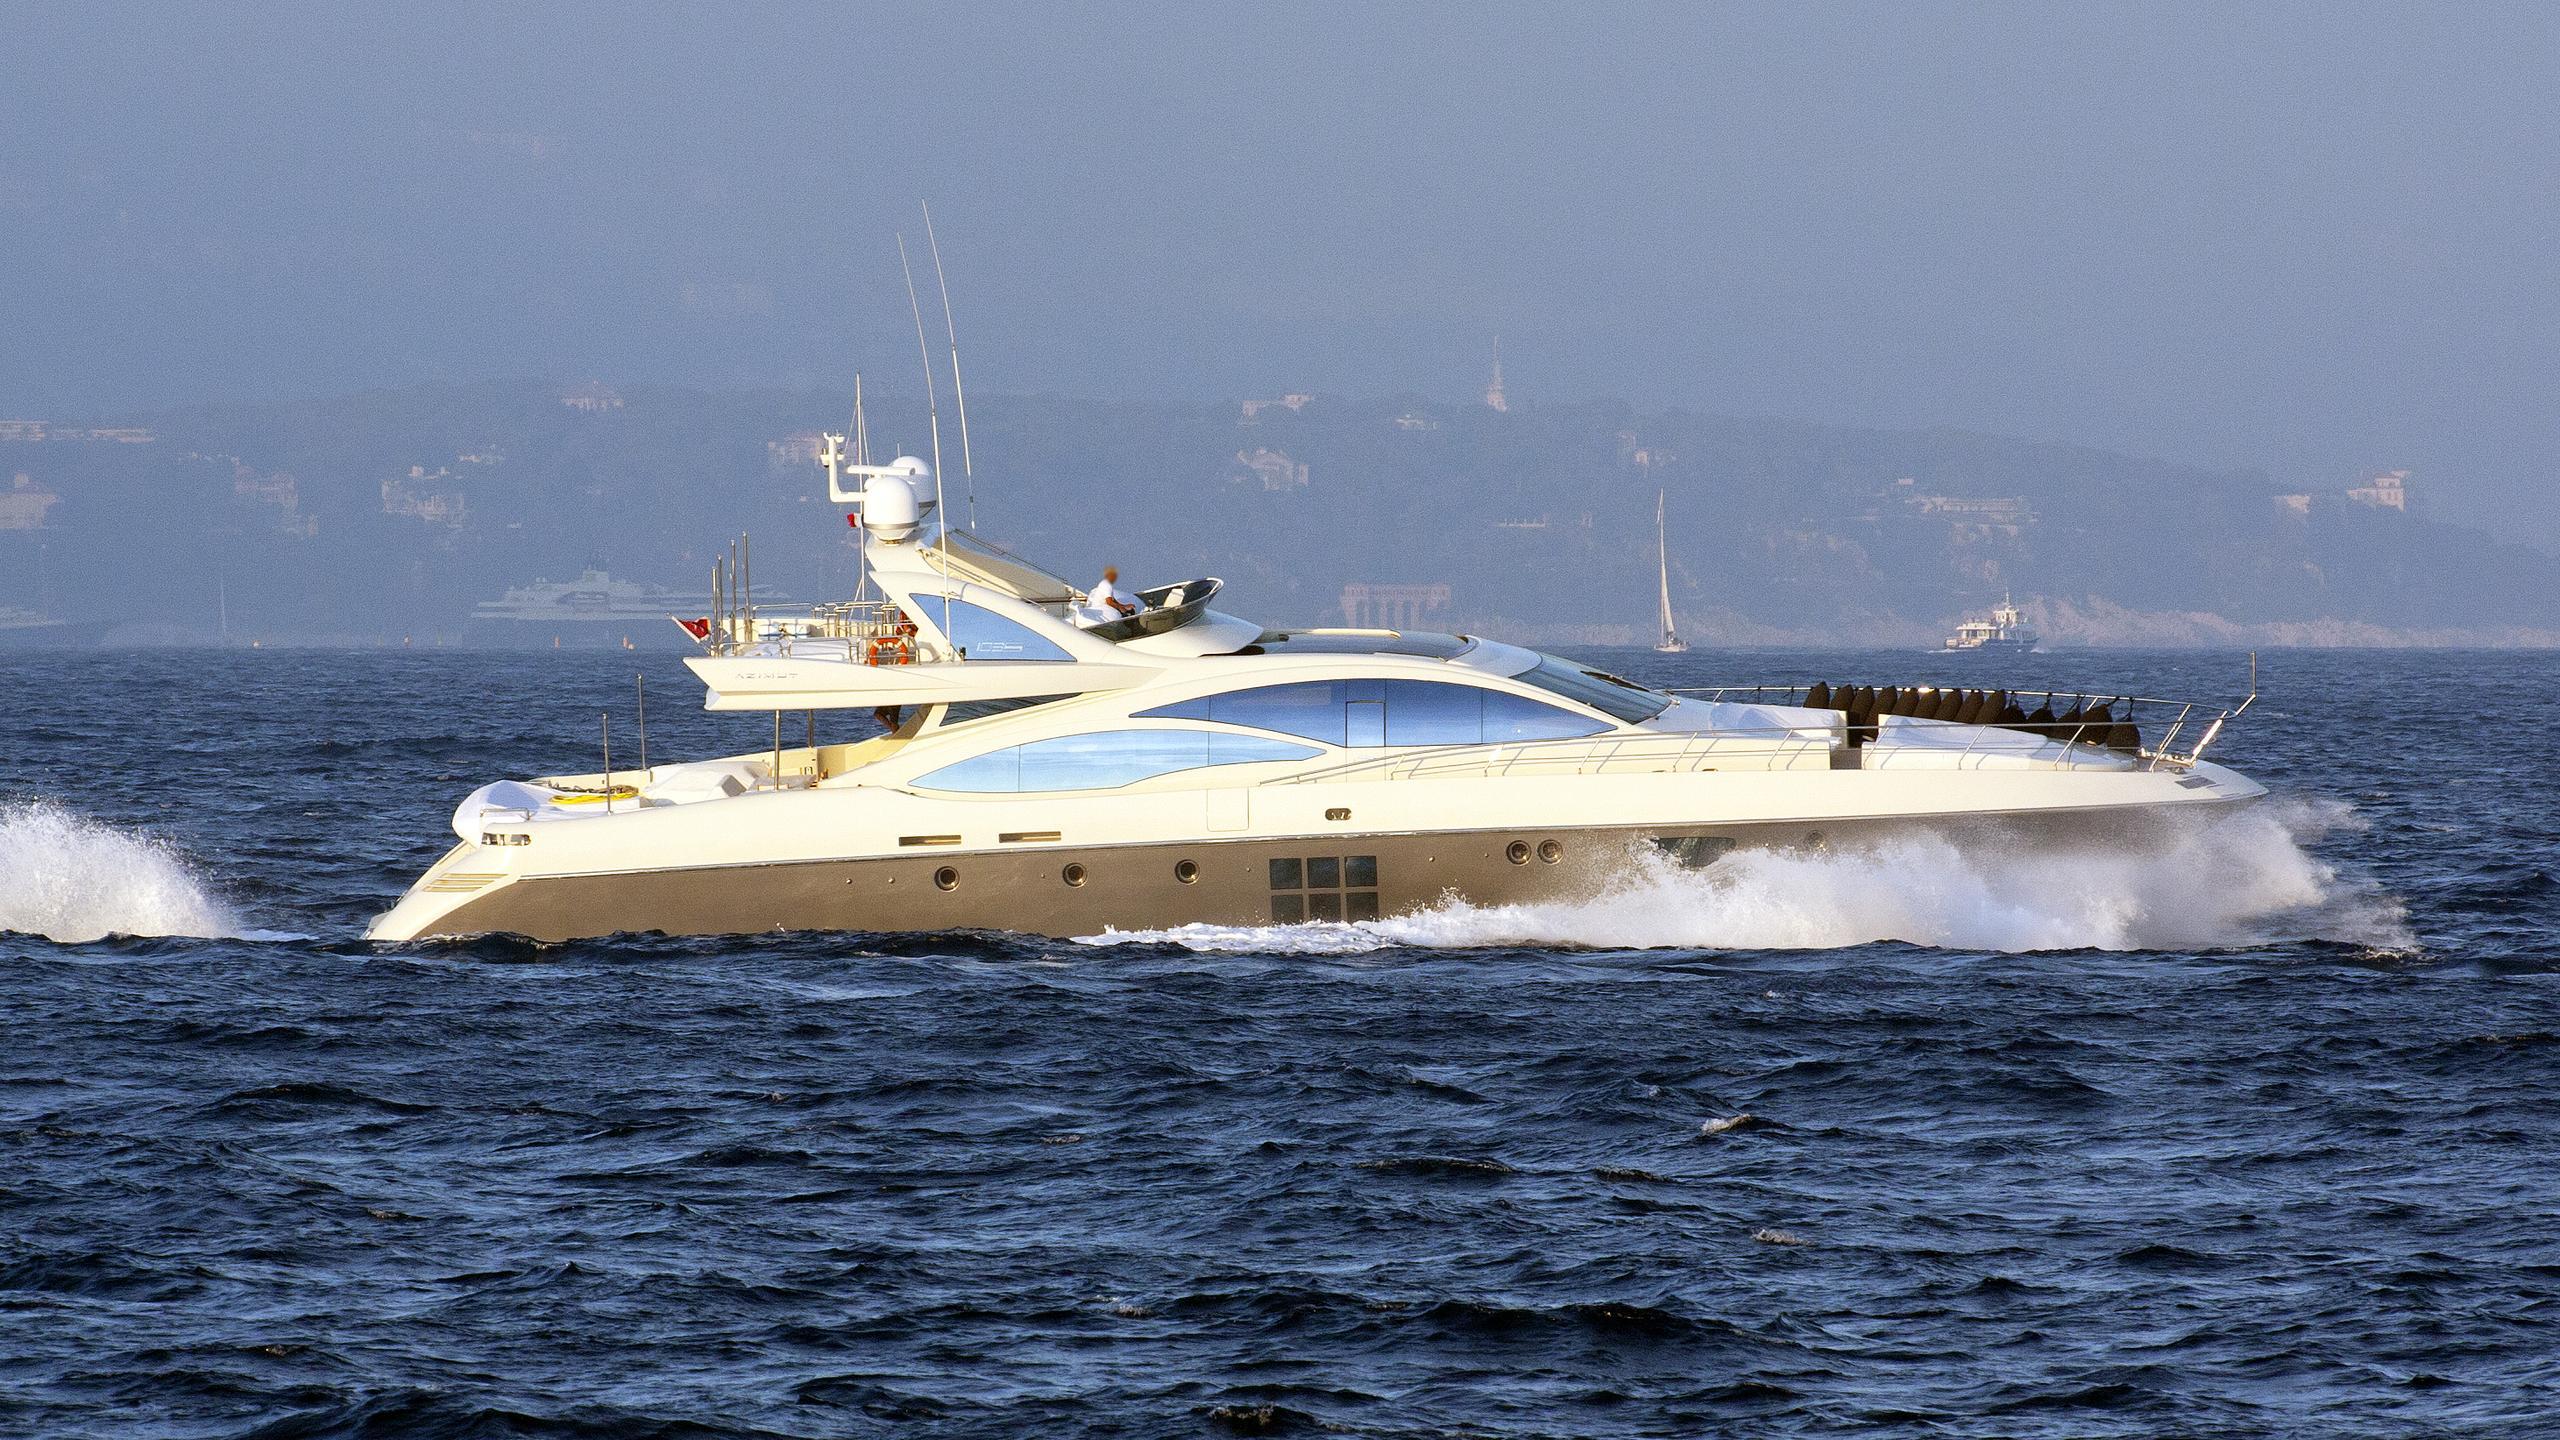 oxygen-2007-motor-yacht-azimut-103s-2007-31m-cruising